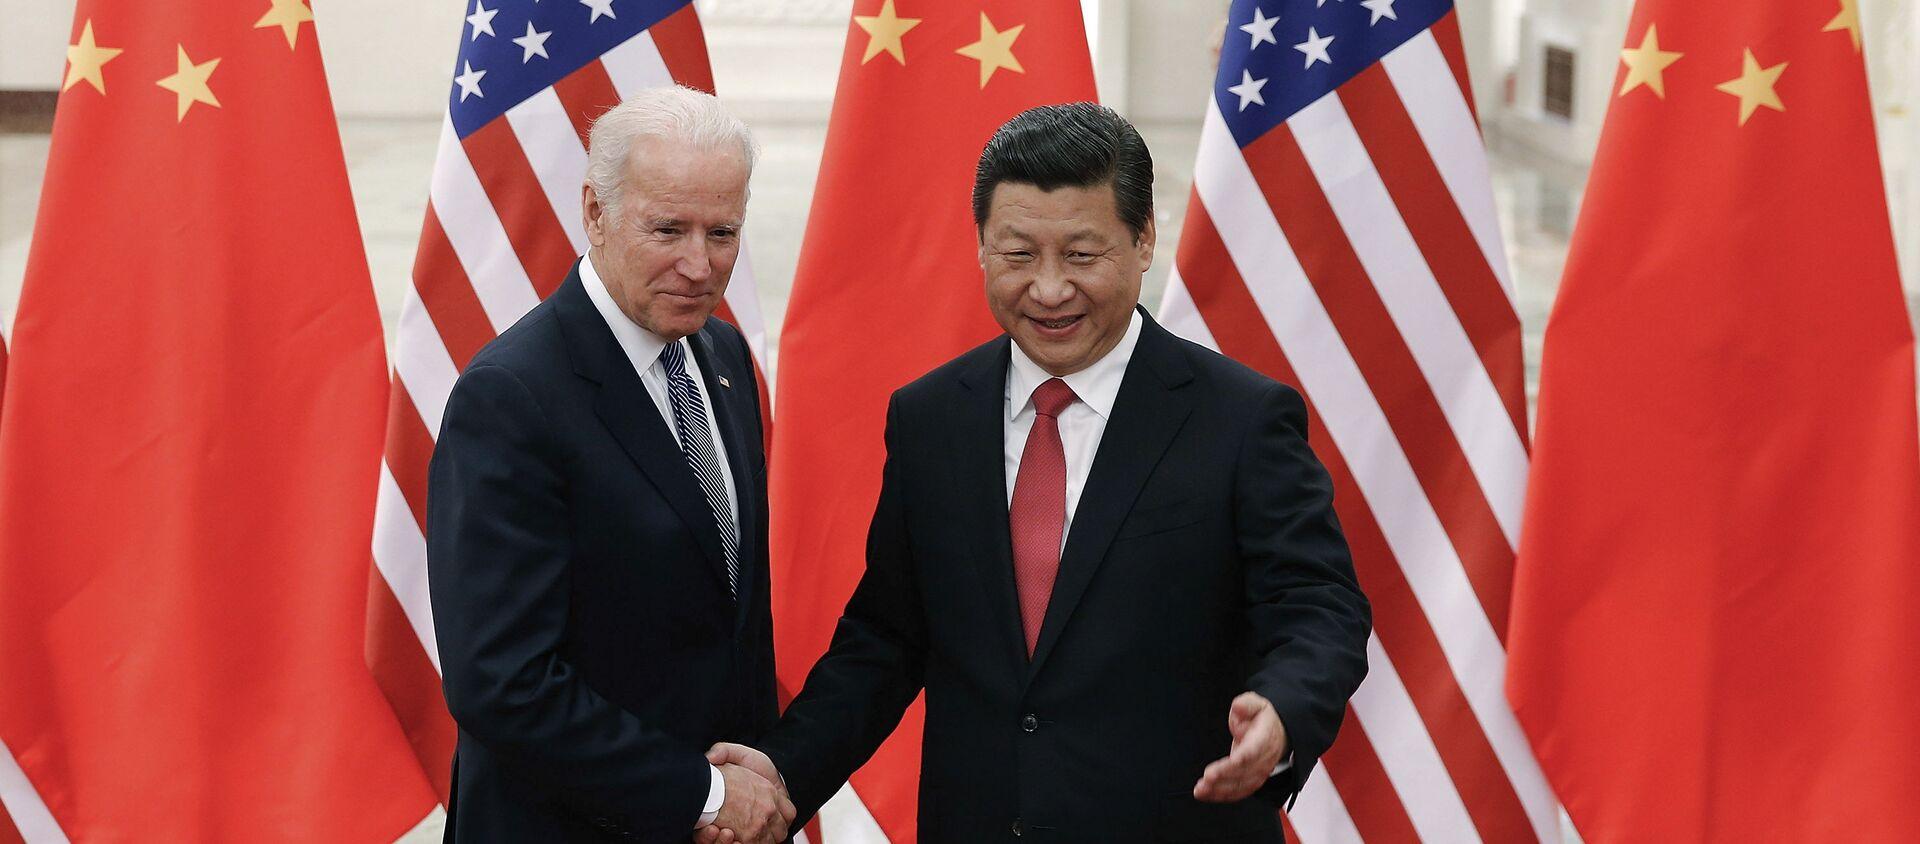 Joe Biden et Xi Jinping. - Sputnik France, 1920, 11.02.2021